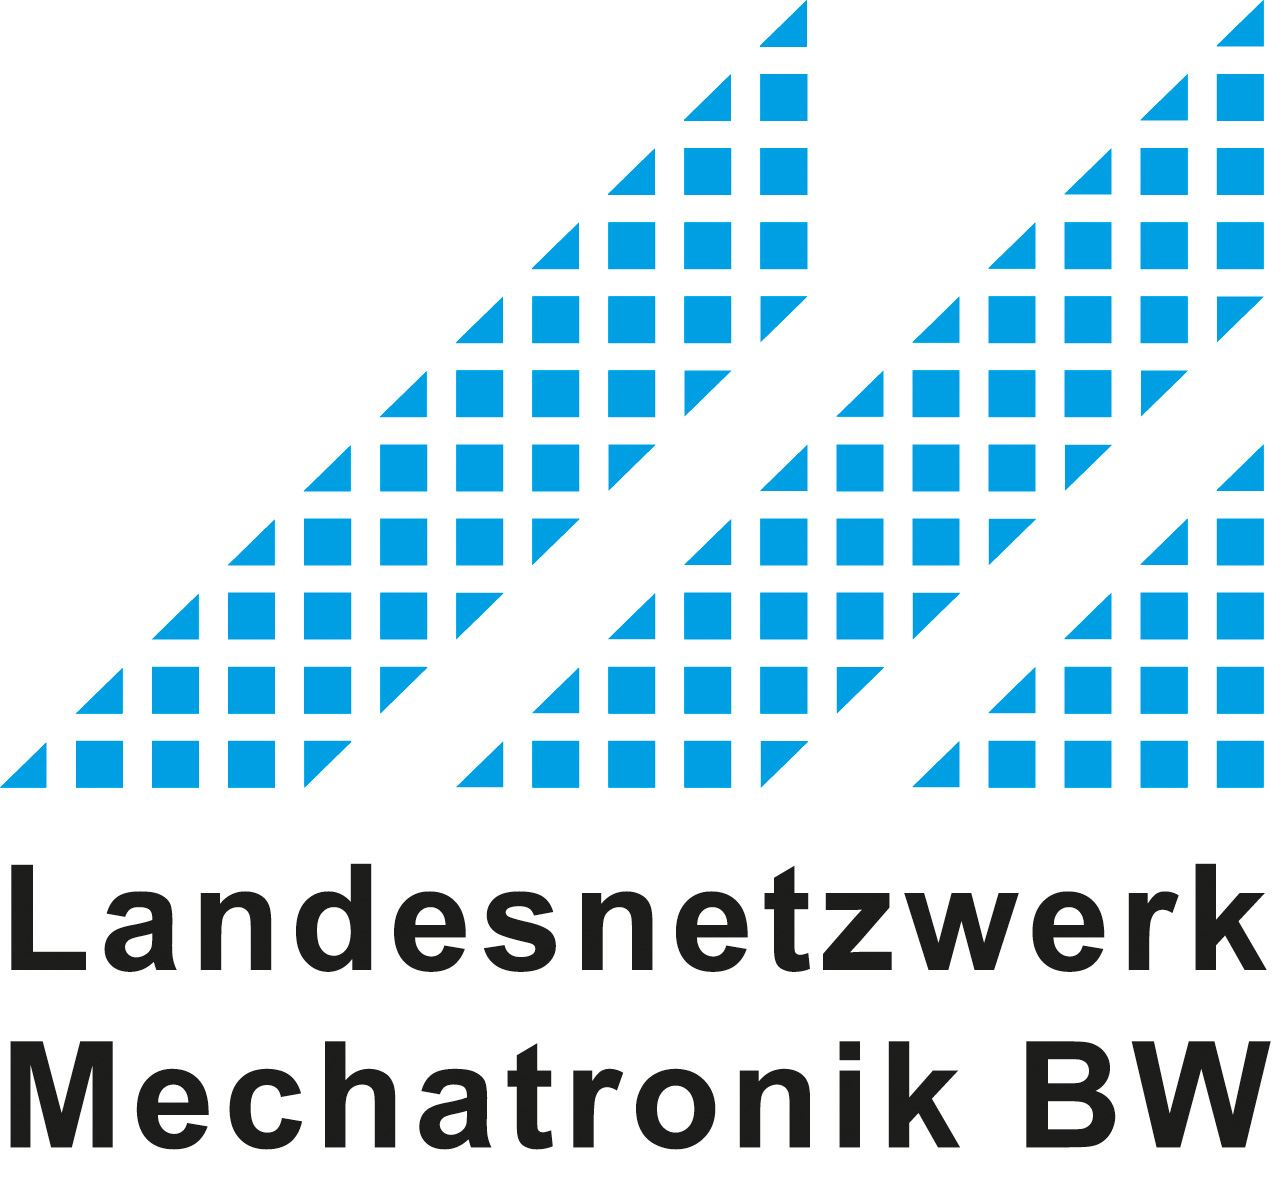 Landesnetzwerk Mechatronik BW GmbH